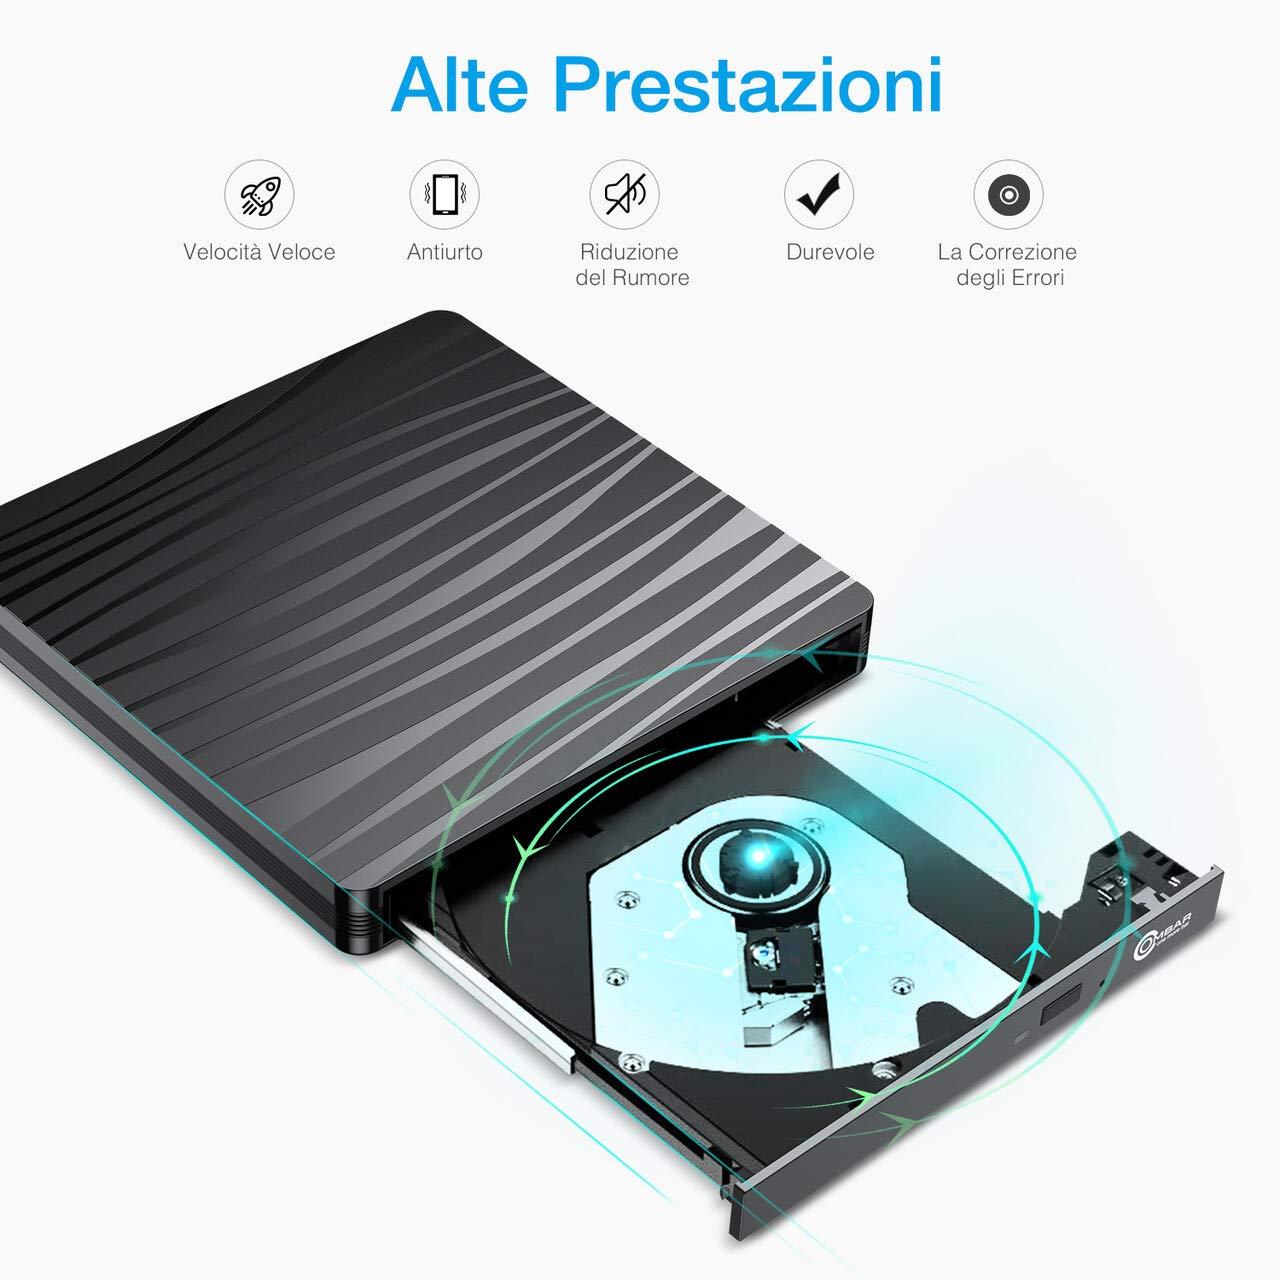 OMBAR Unità Ottica Esterna CD DVD , USB 3.0 e Tipo-C Dual Port Adatto per Laptop, Desktop, Mac, Macbook, IOS, Windows 10/8.1/7 e Linux, Nero